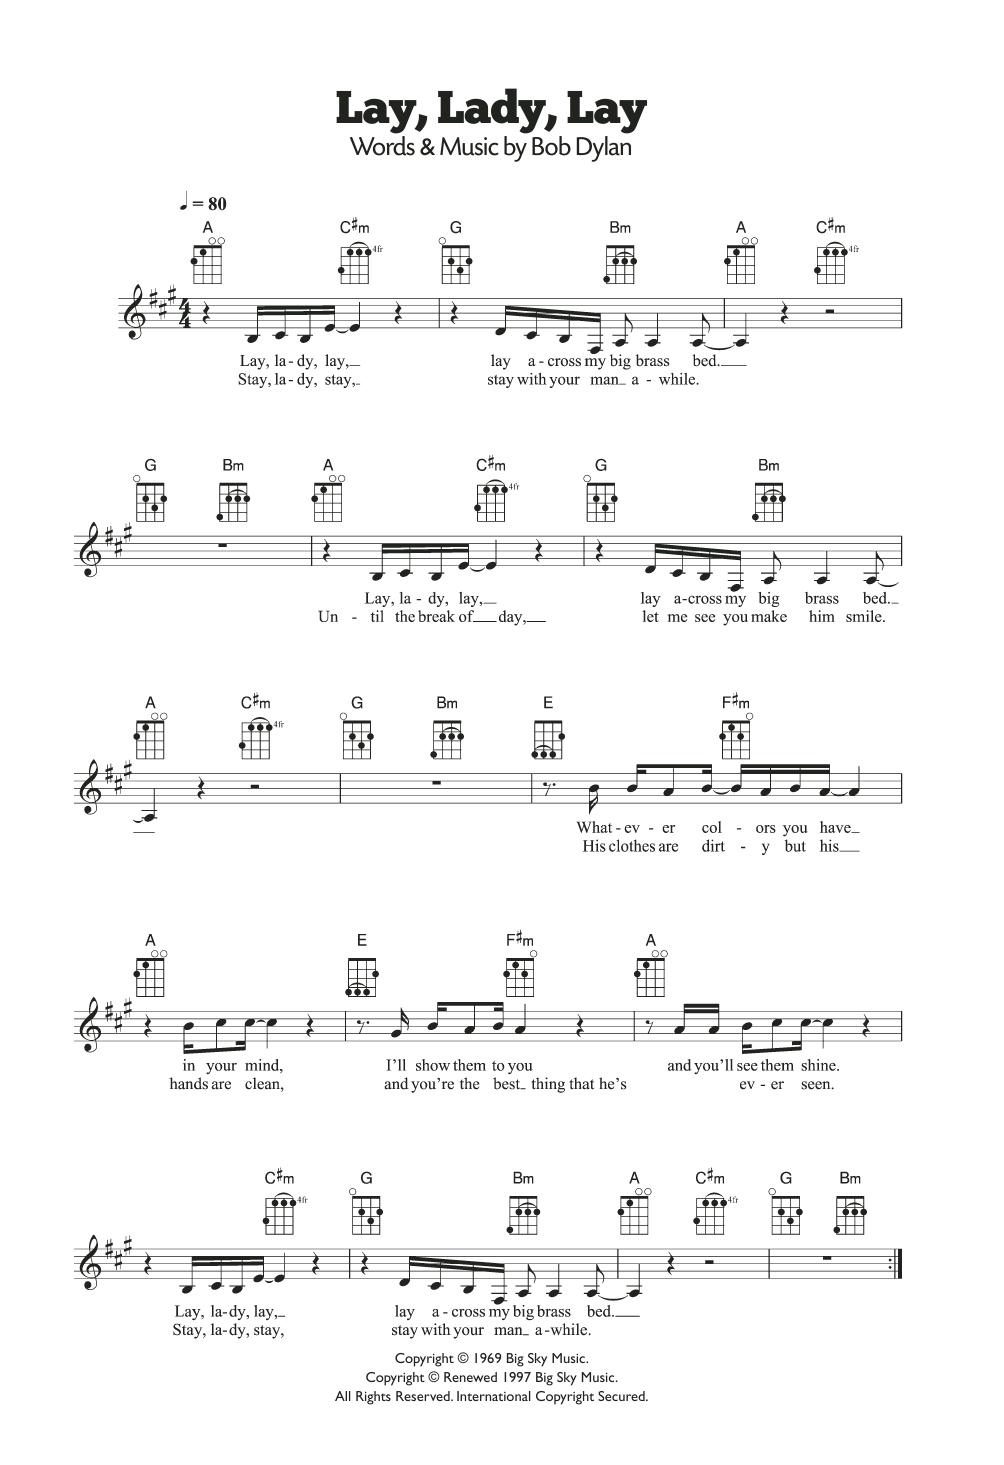 Lay Lady Lay Sheet Music